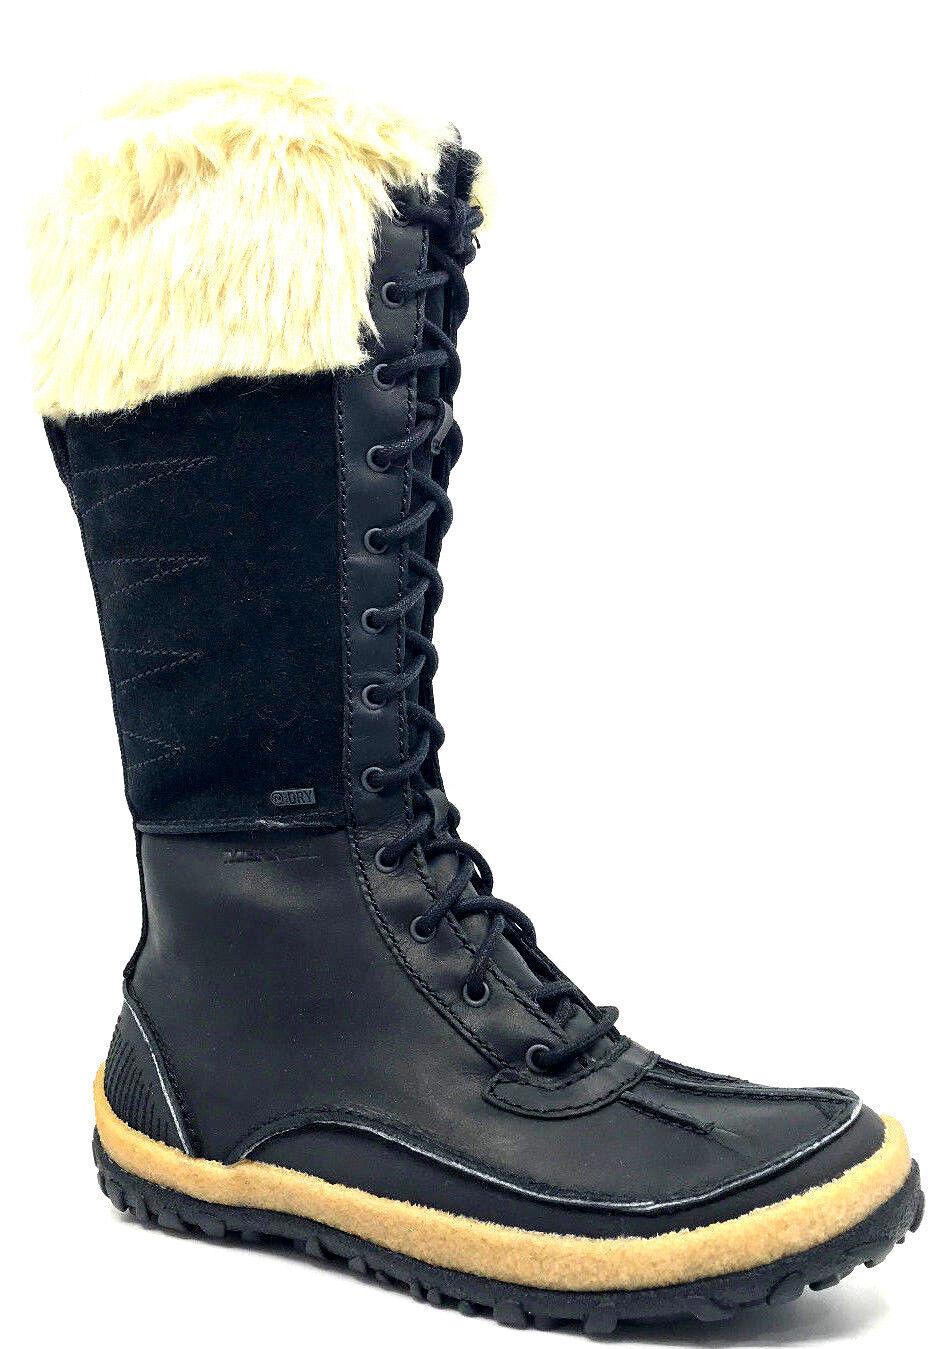 6be7ead652d Merrell Tremblant Tall Polar Waterproof Womens Snow Boot Black J45734 Size  6.5